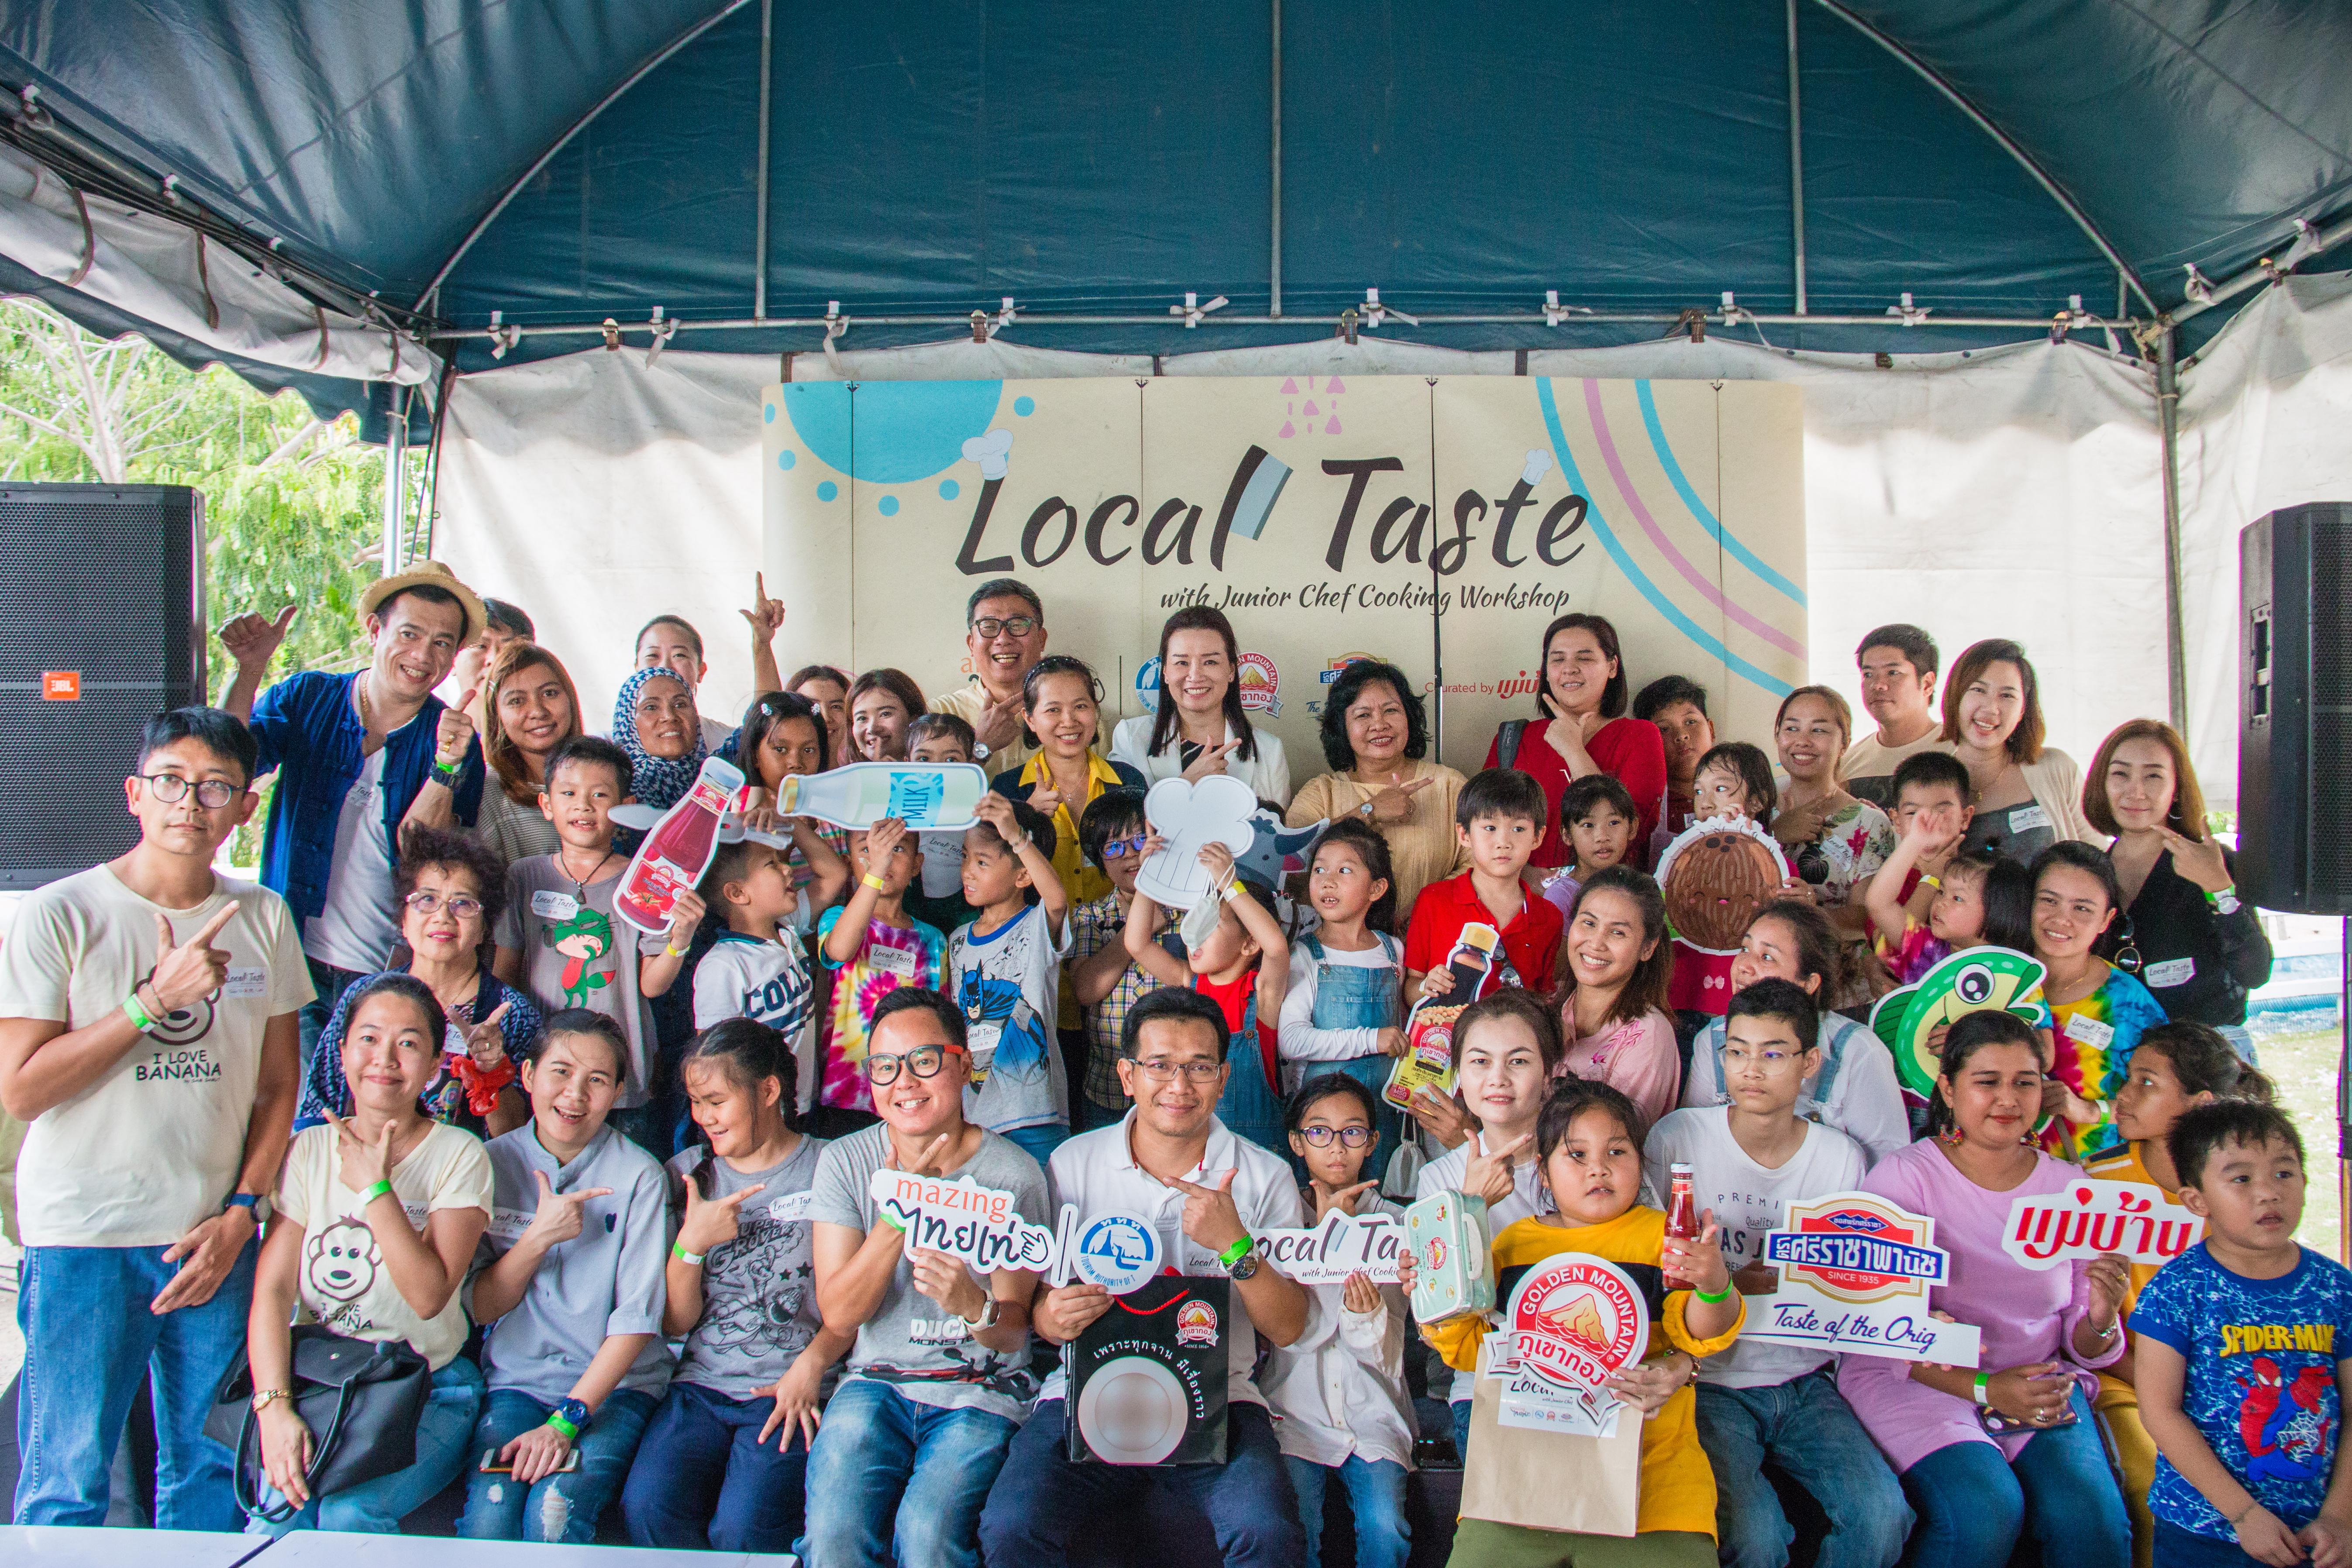 """A Day Trip by ซอสภูเขาทอง"" เที่ยวฉะเชิงเทรา ภายใต้โครงการ ""Local Taste with Junior Chef Cooking Workshop"" (20 กรกฏาคม 2562)"